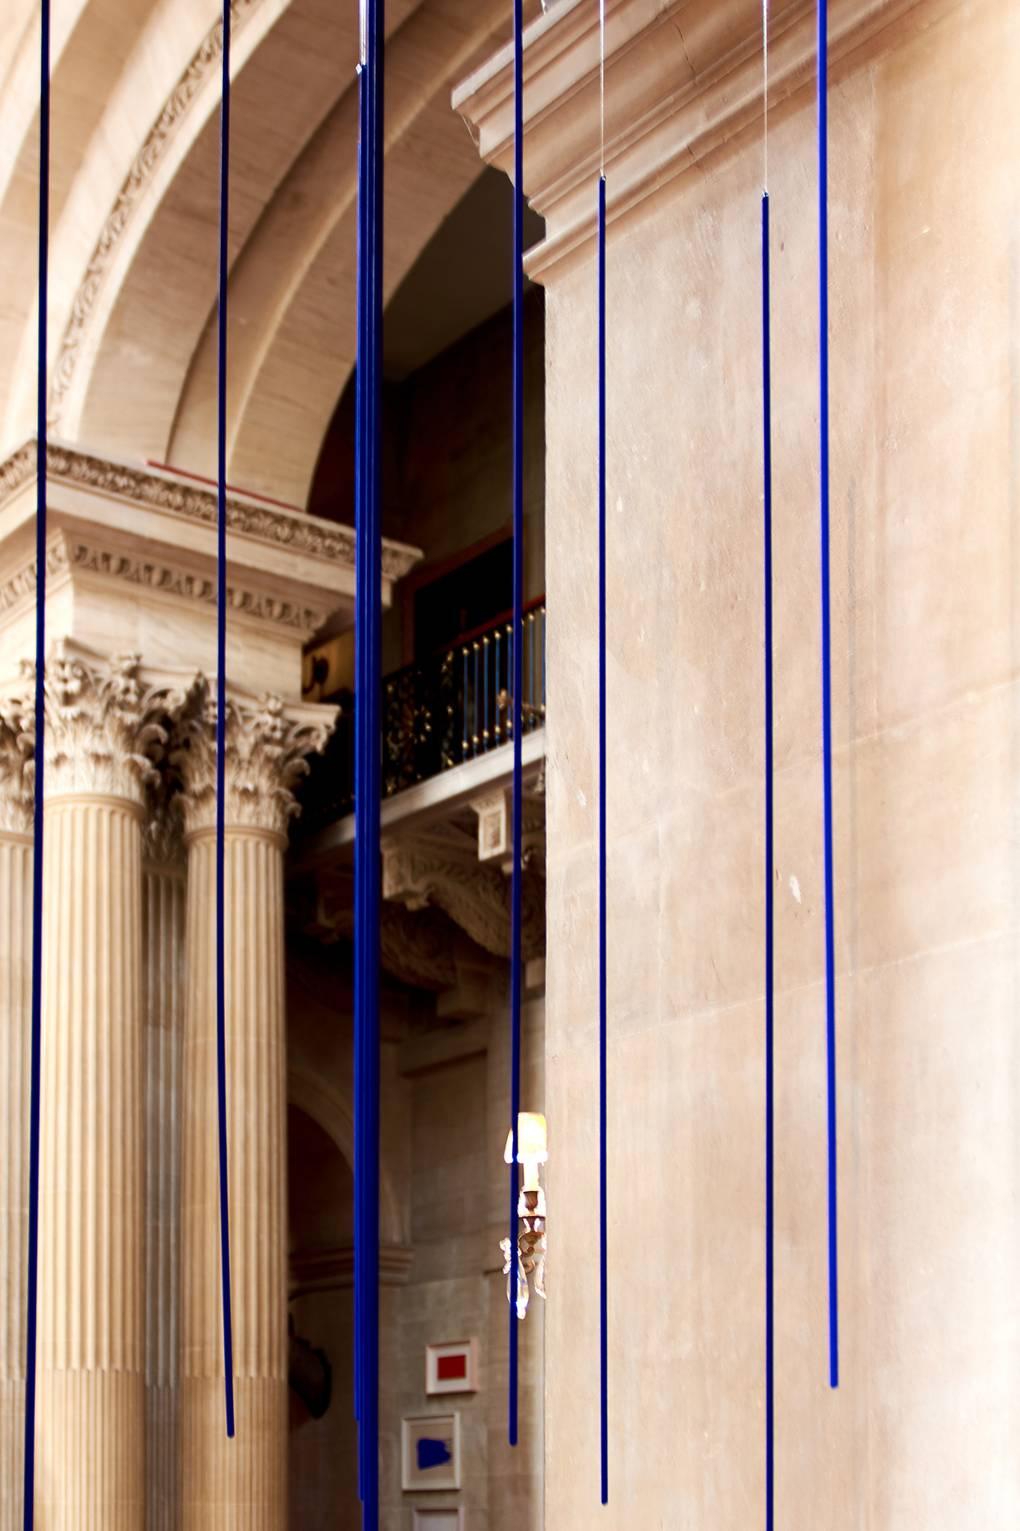 art classes, london fine art studios, london arts, art classes, fine art, art workshops, materials workshop, the colour blue, blue, Pluie bleue, 1957, suspended from the ceiling of the Great Hall.